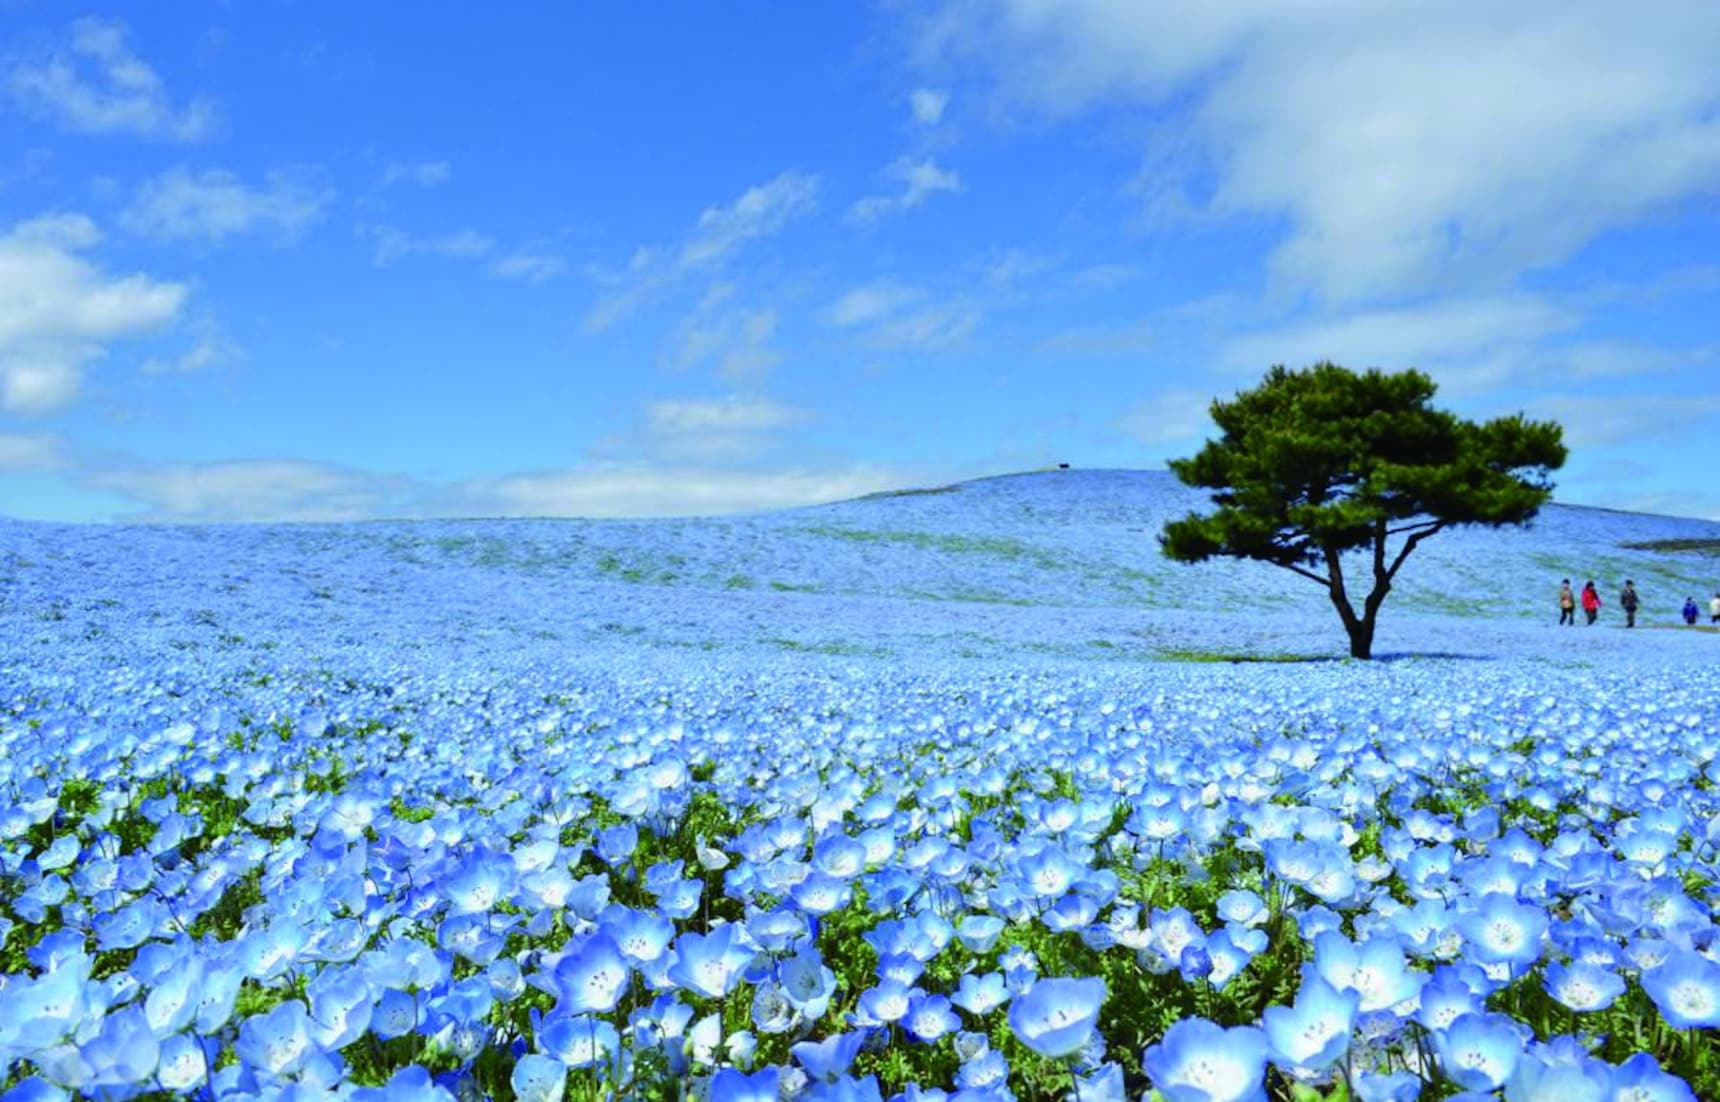 12 Things to Do in Ibaraki in Spring